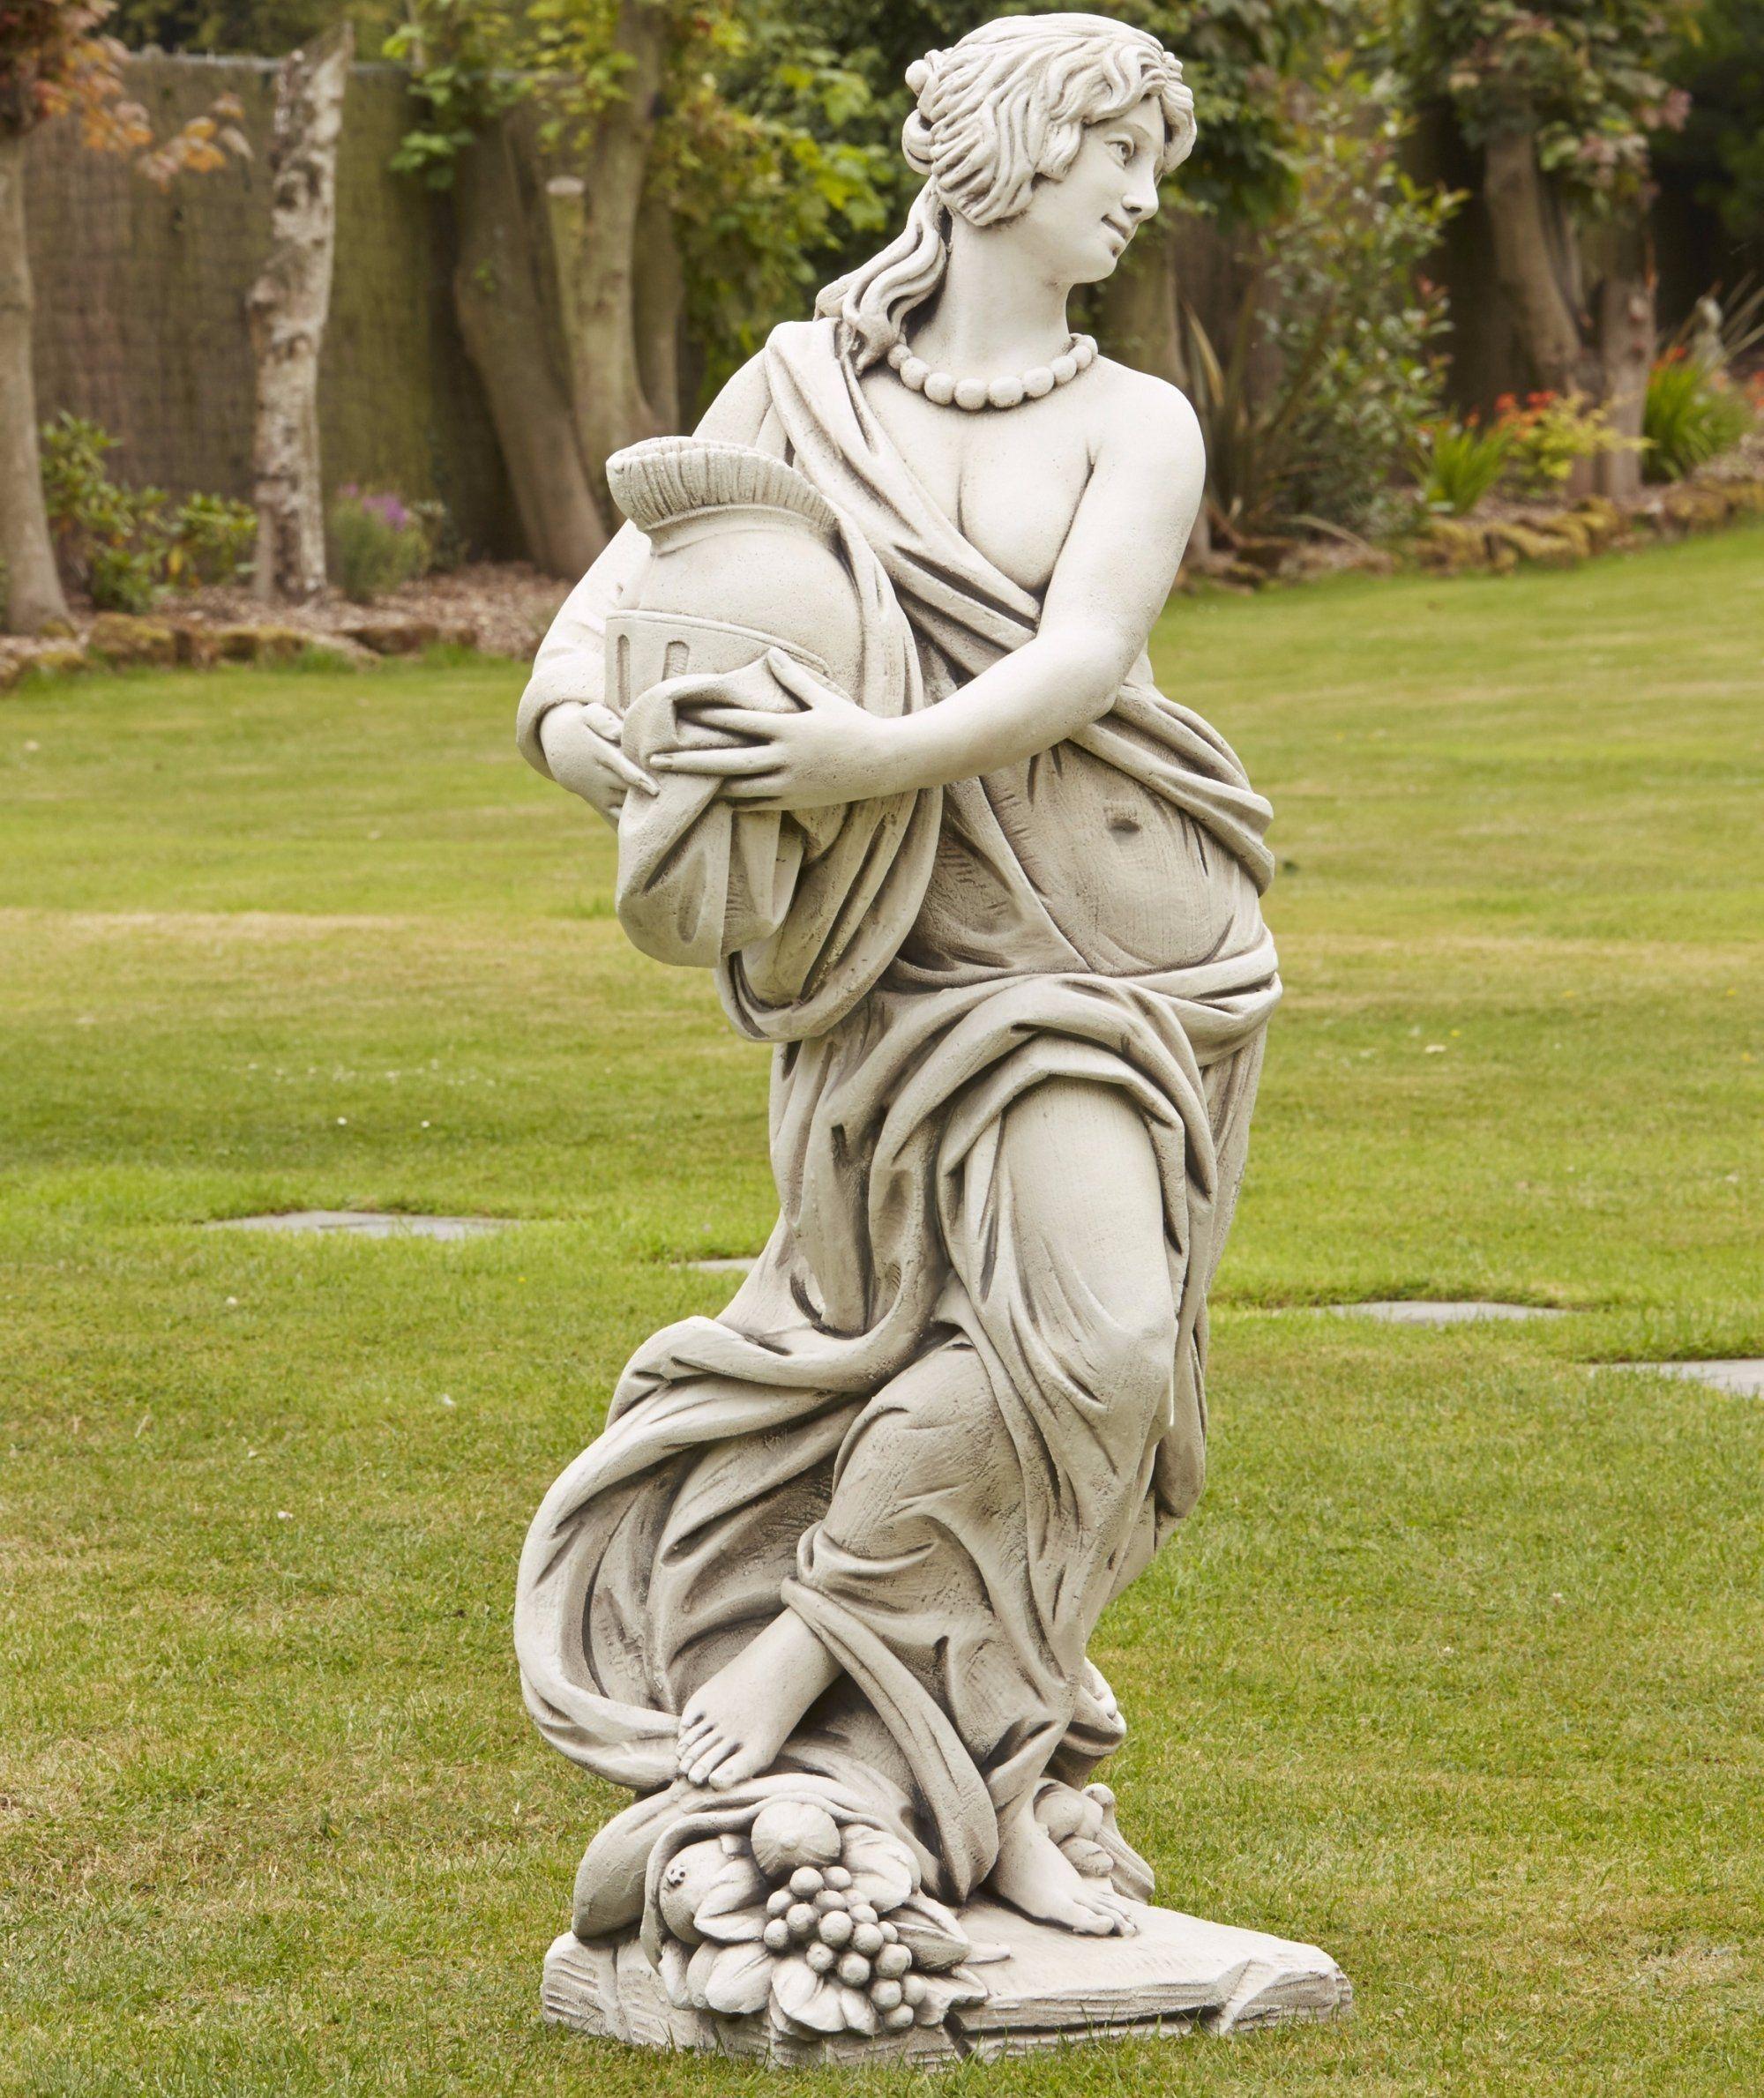 Stone sculpture photo